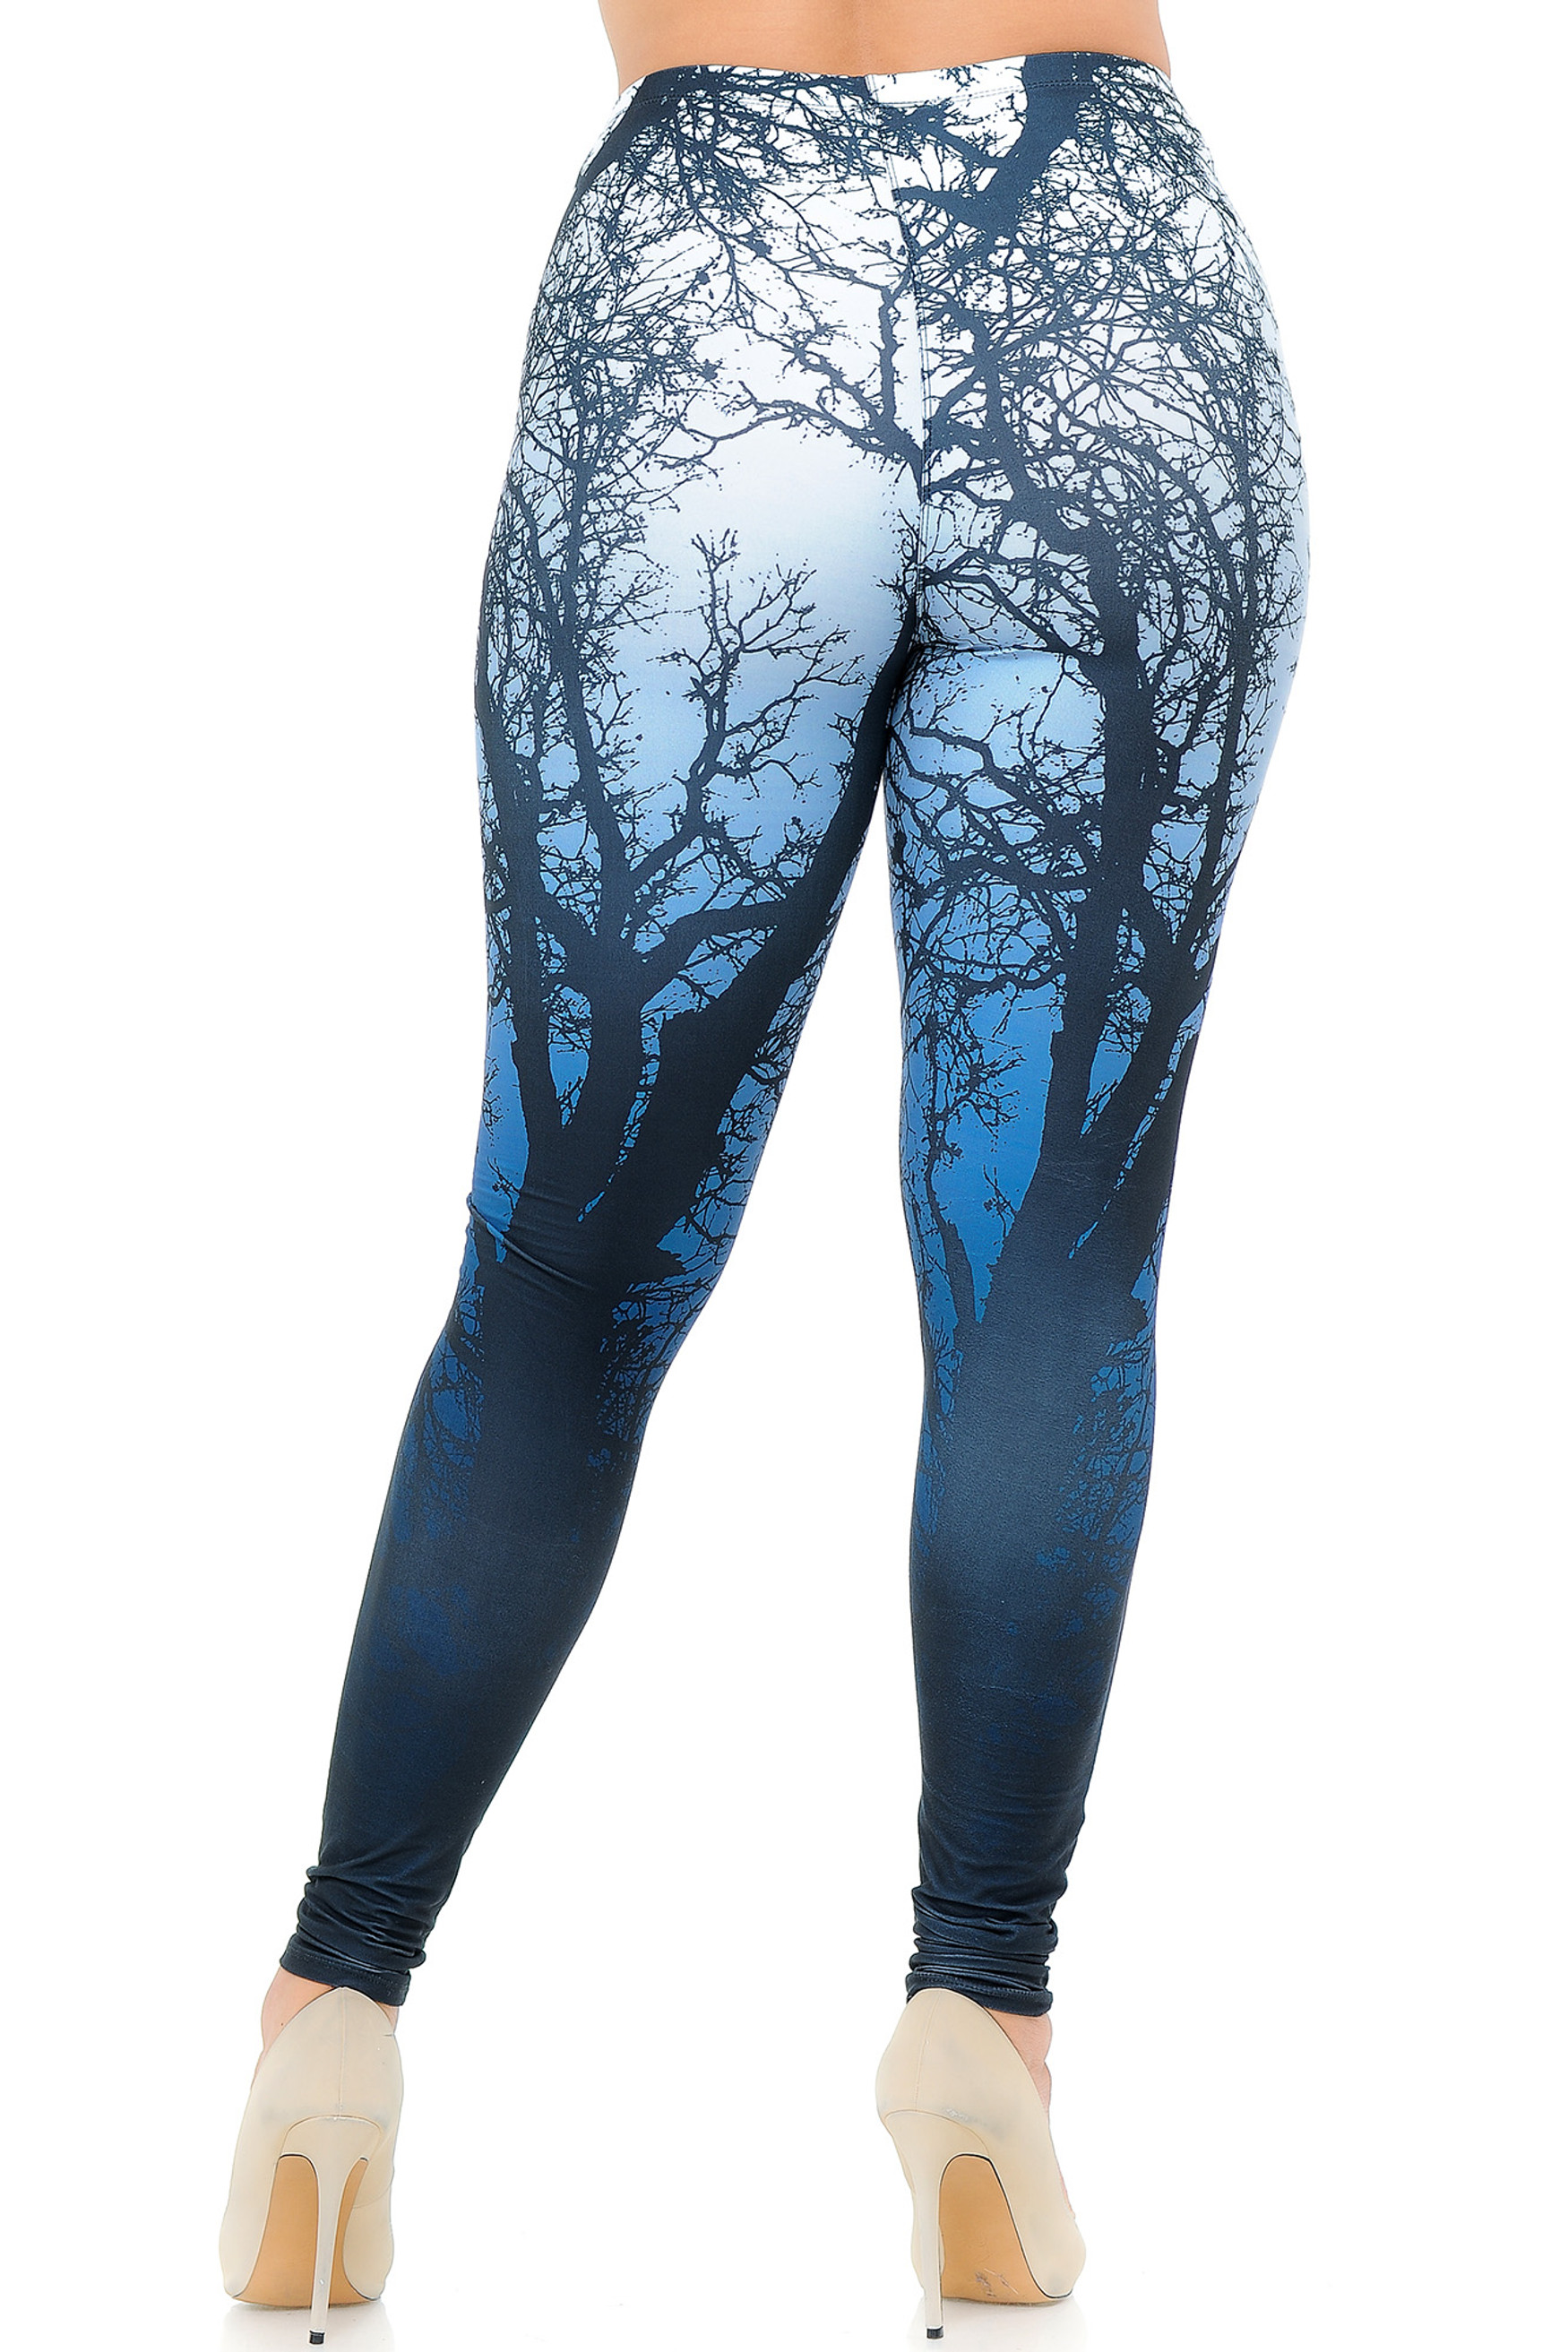 Creamy Soft Ombre Forest Plus Size Leggings - USA Fashion™